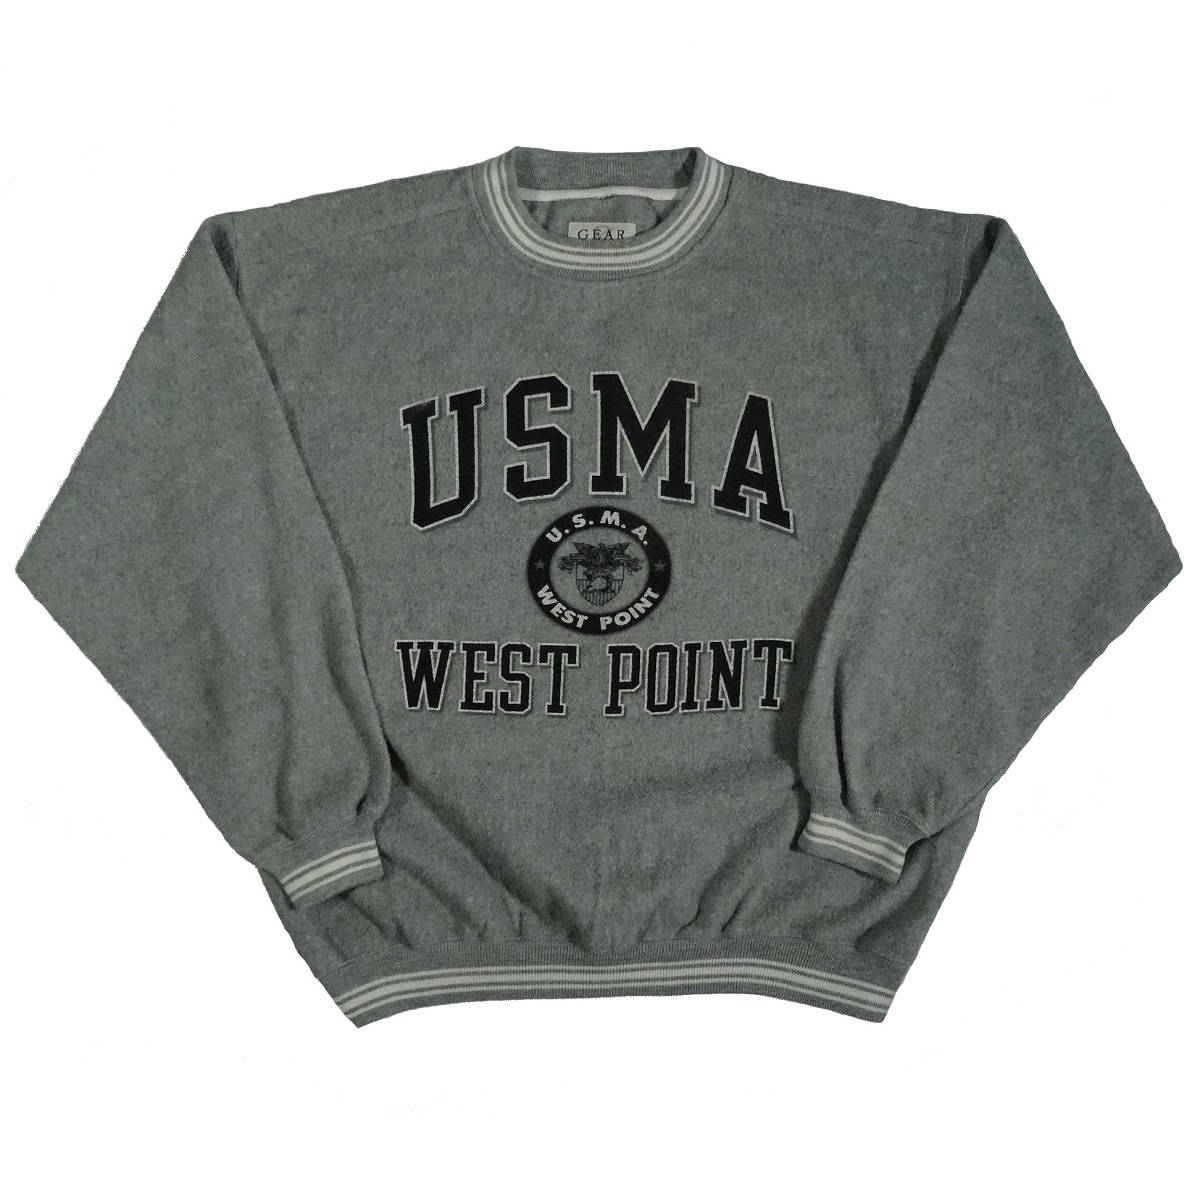 usma west point vintage sweatshirt front of shirt